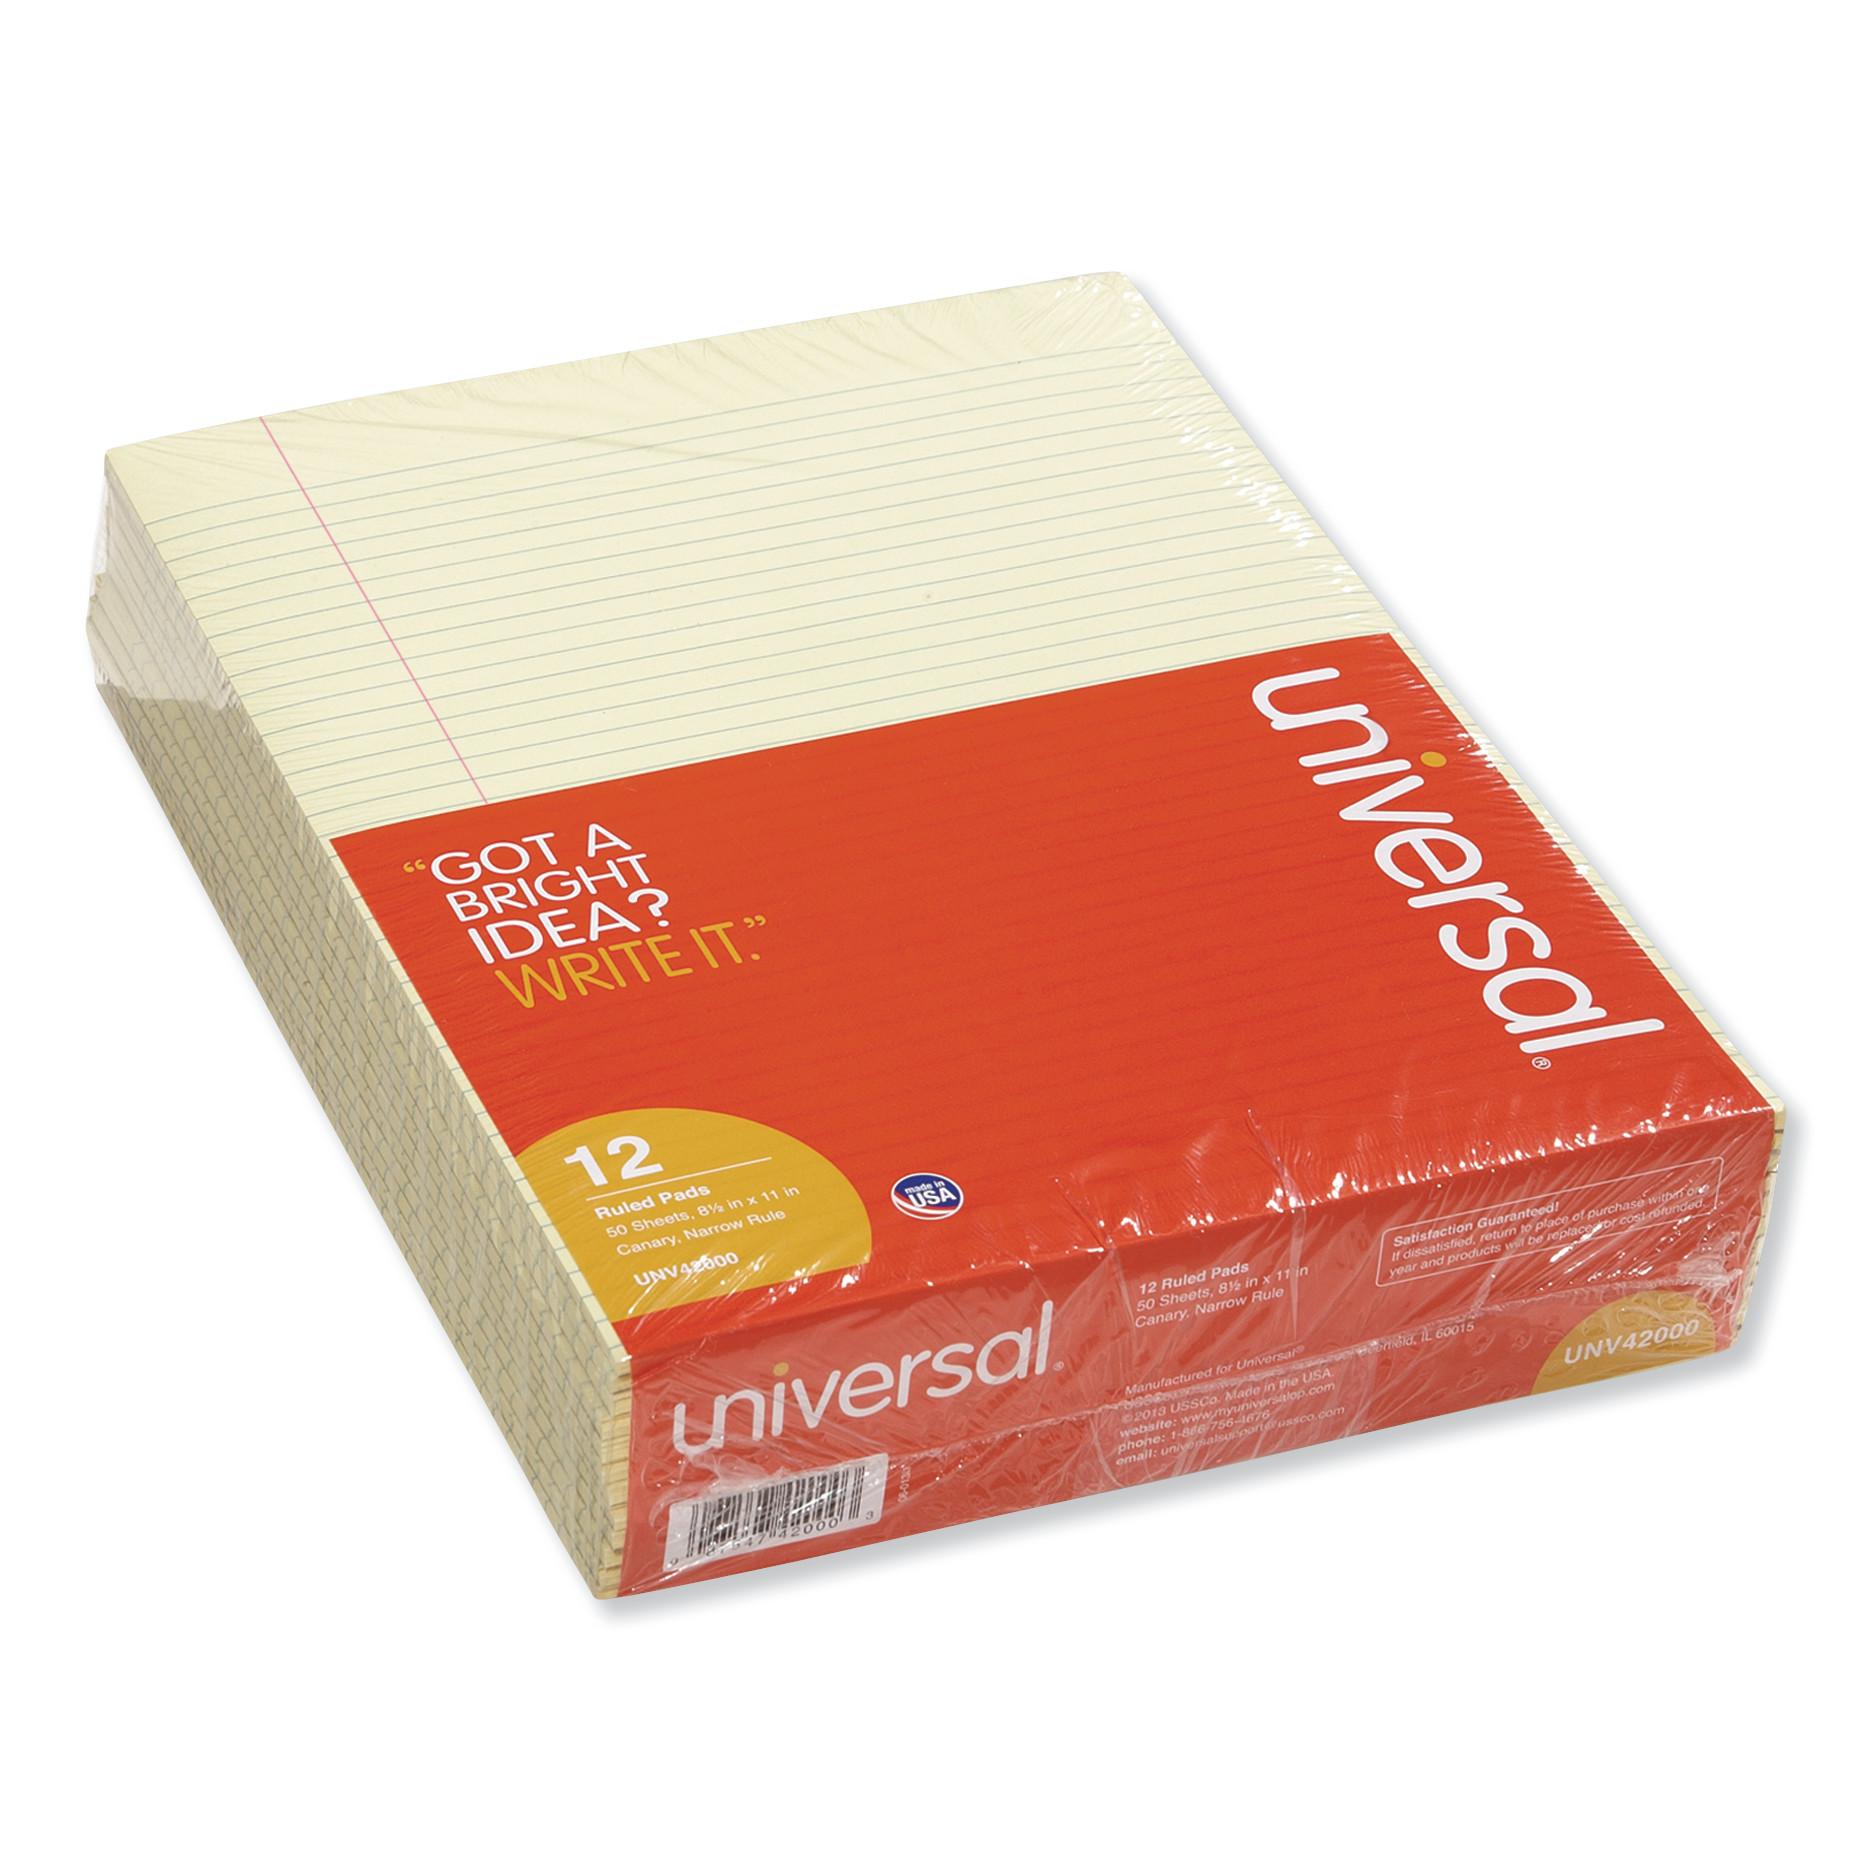 Glue Top Writing Pads, Narrow Rule, Ltr, Canary, 50 Sheet Pads/Pack, Dozen